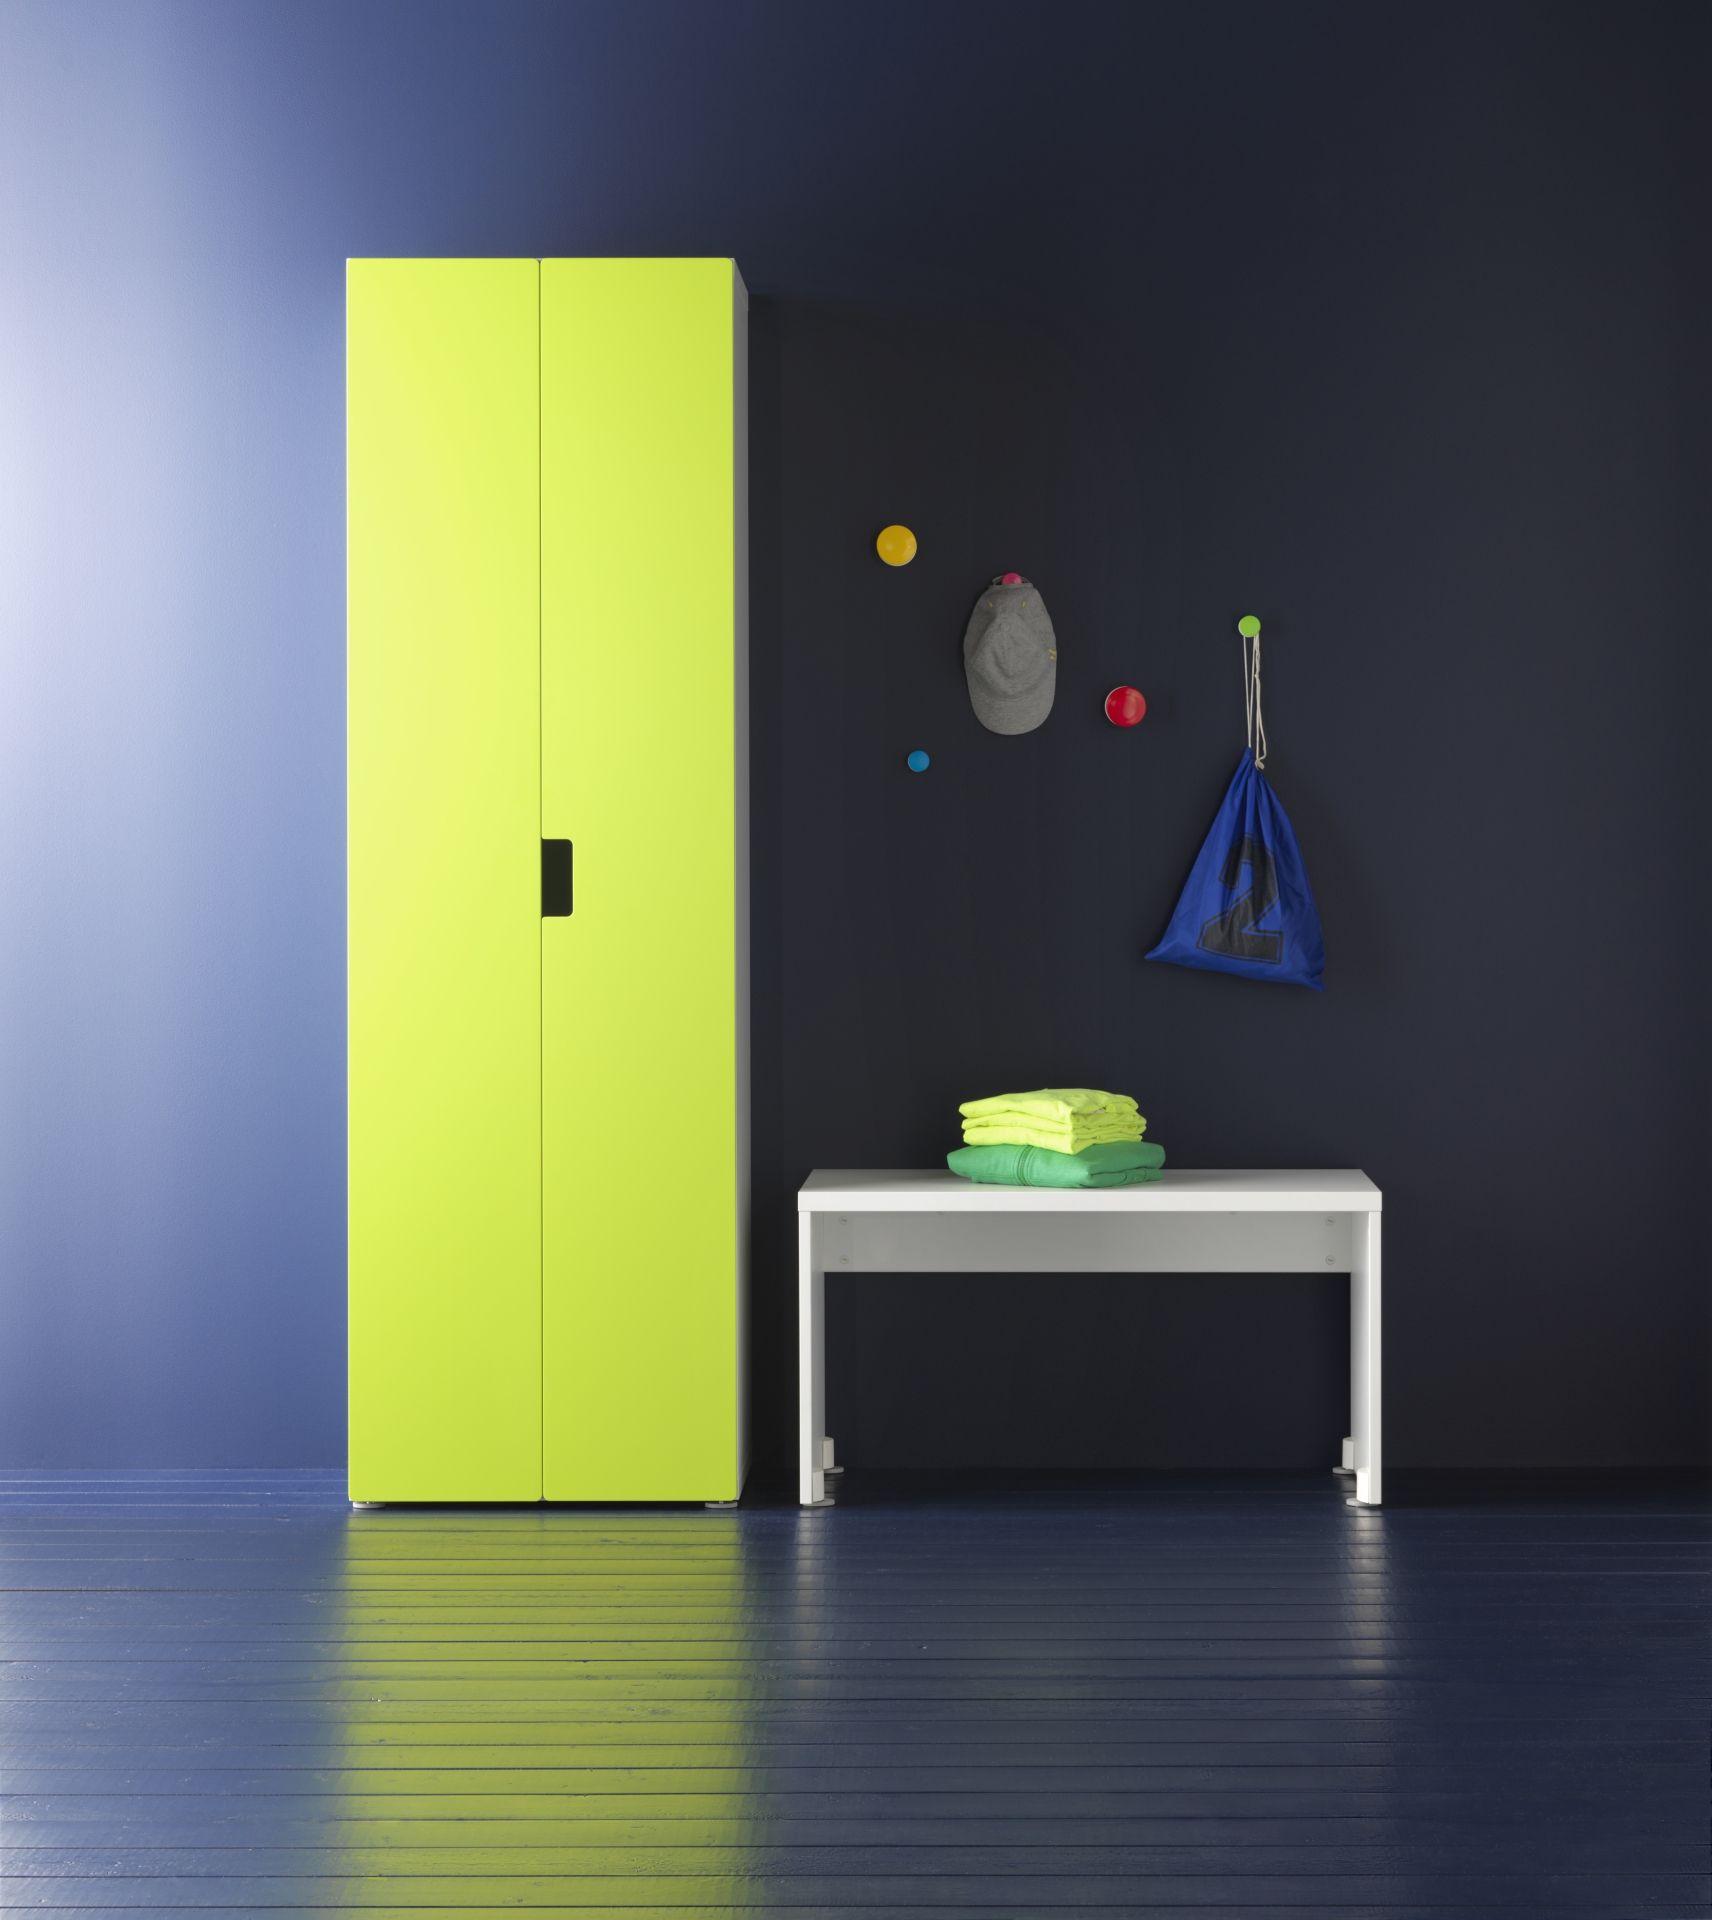 Ikea Portis Schoenenrek.Tjusig Kapstok Affordable Ikea Tjusig Kapstok Zwart Nieuw In